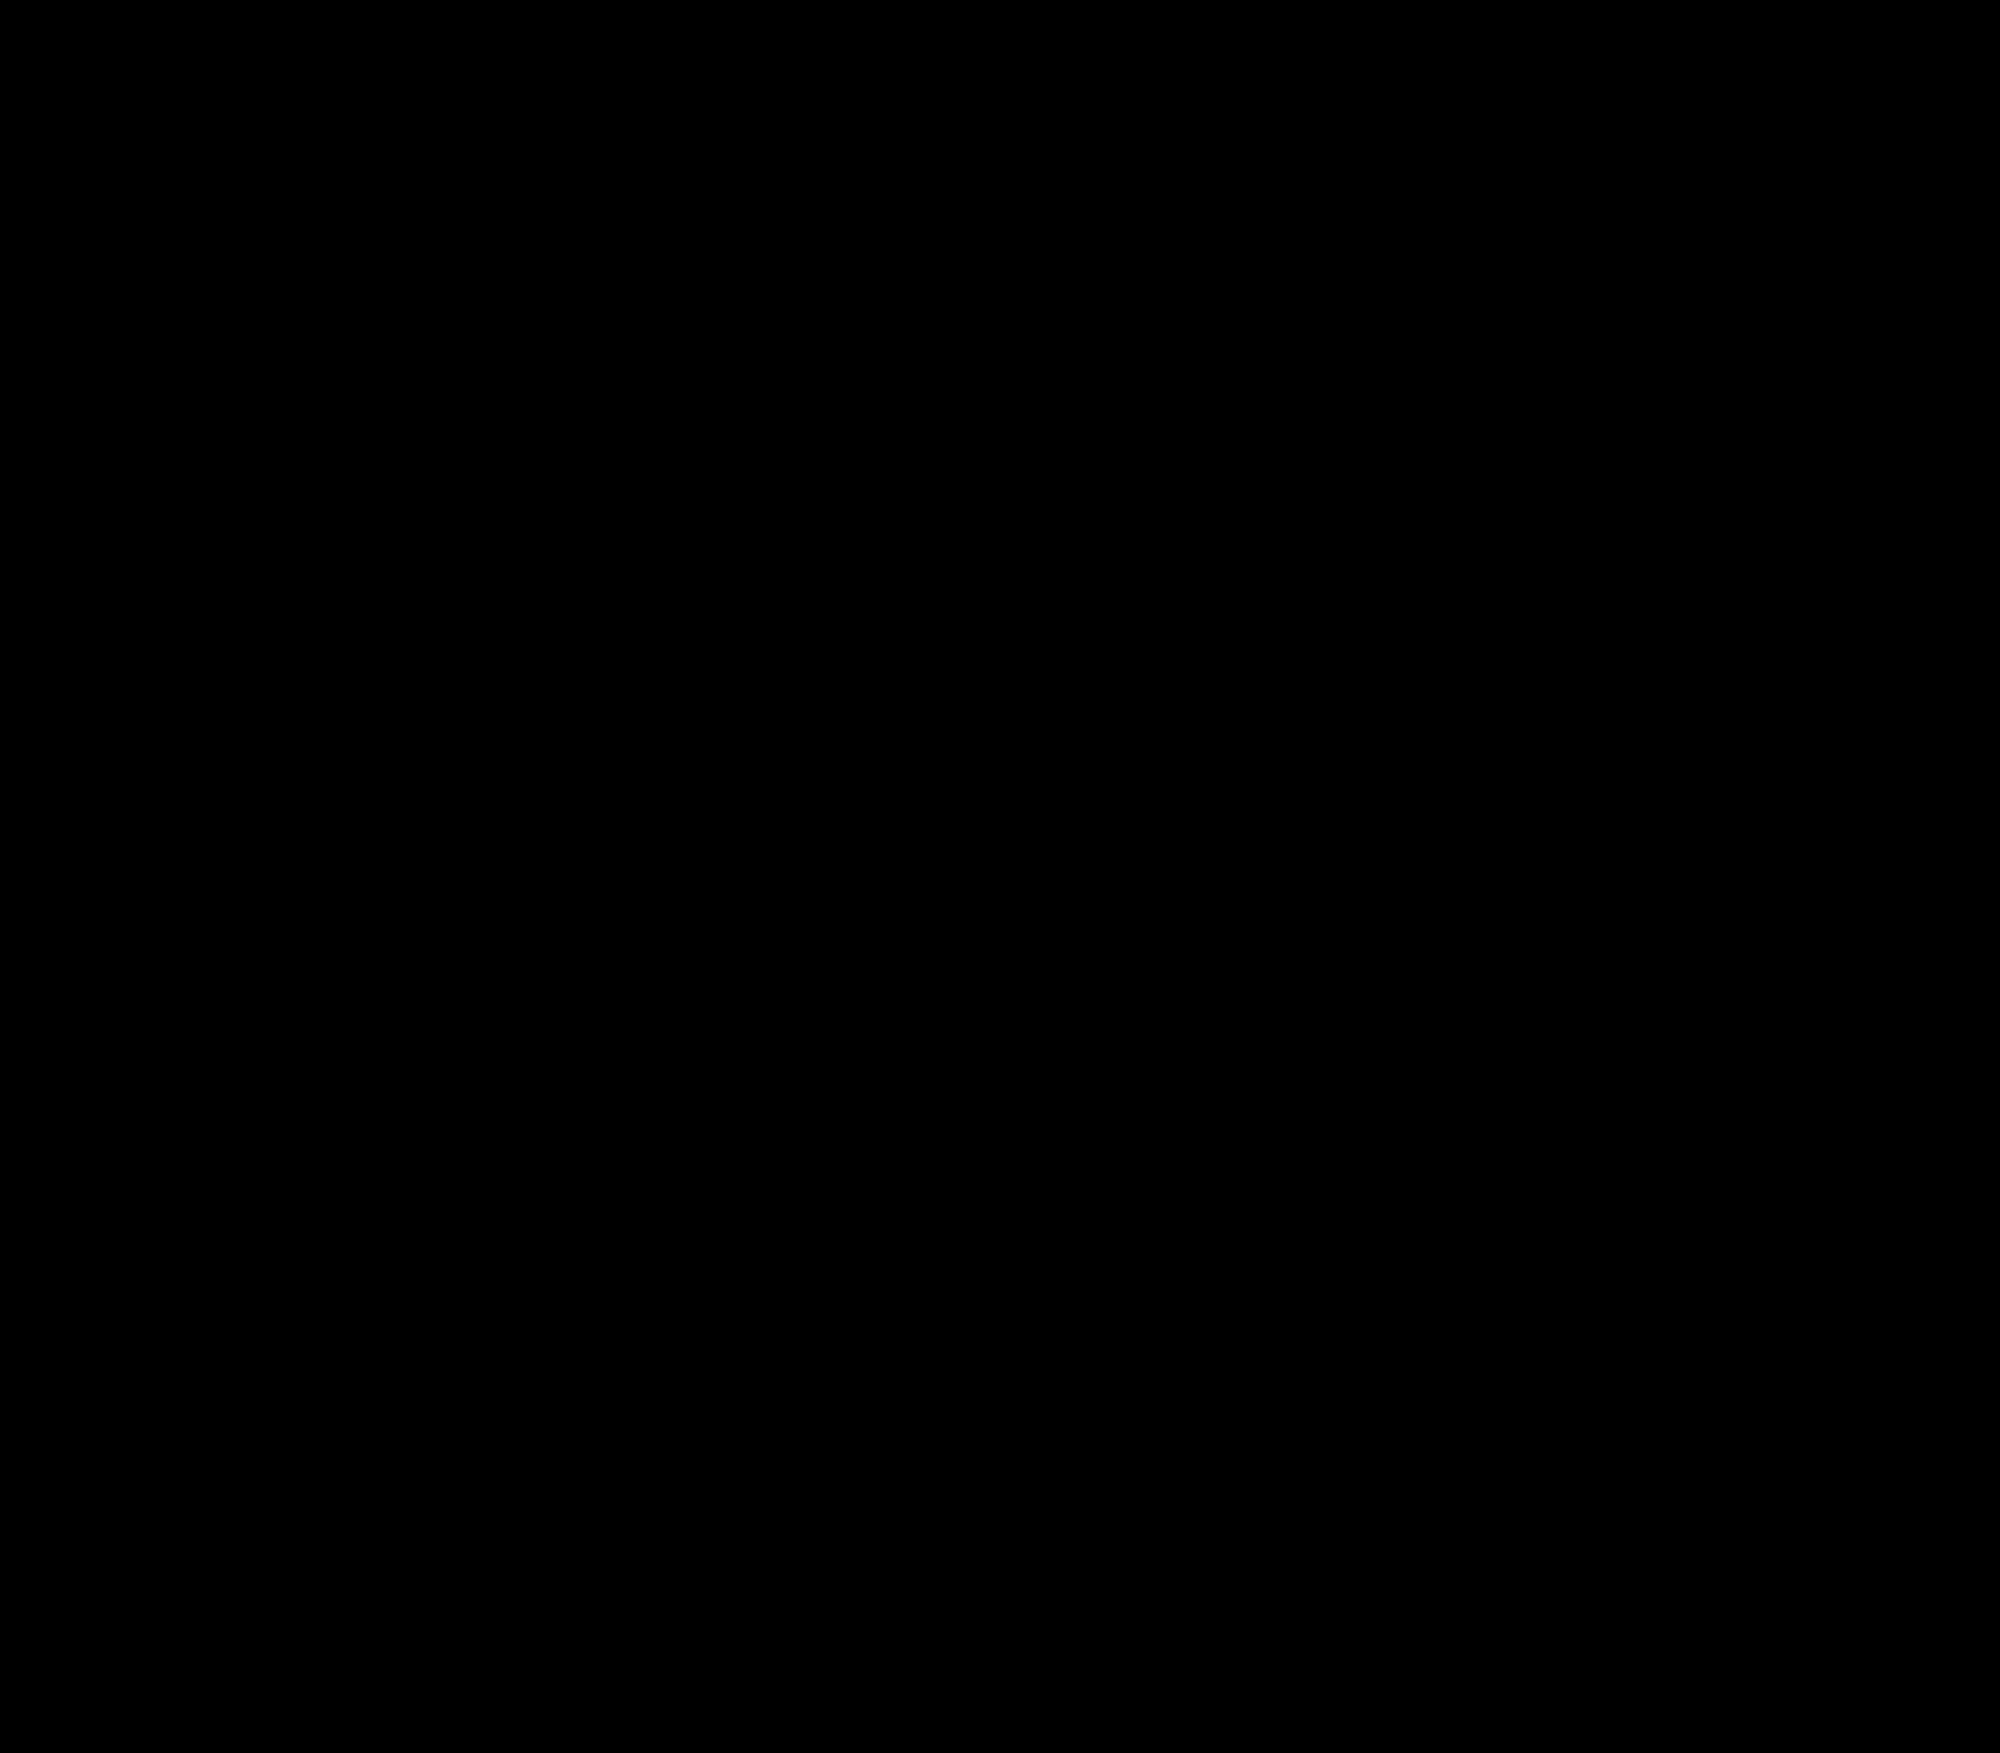 logo-black(10).png